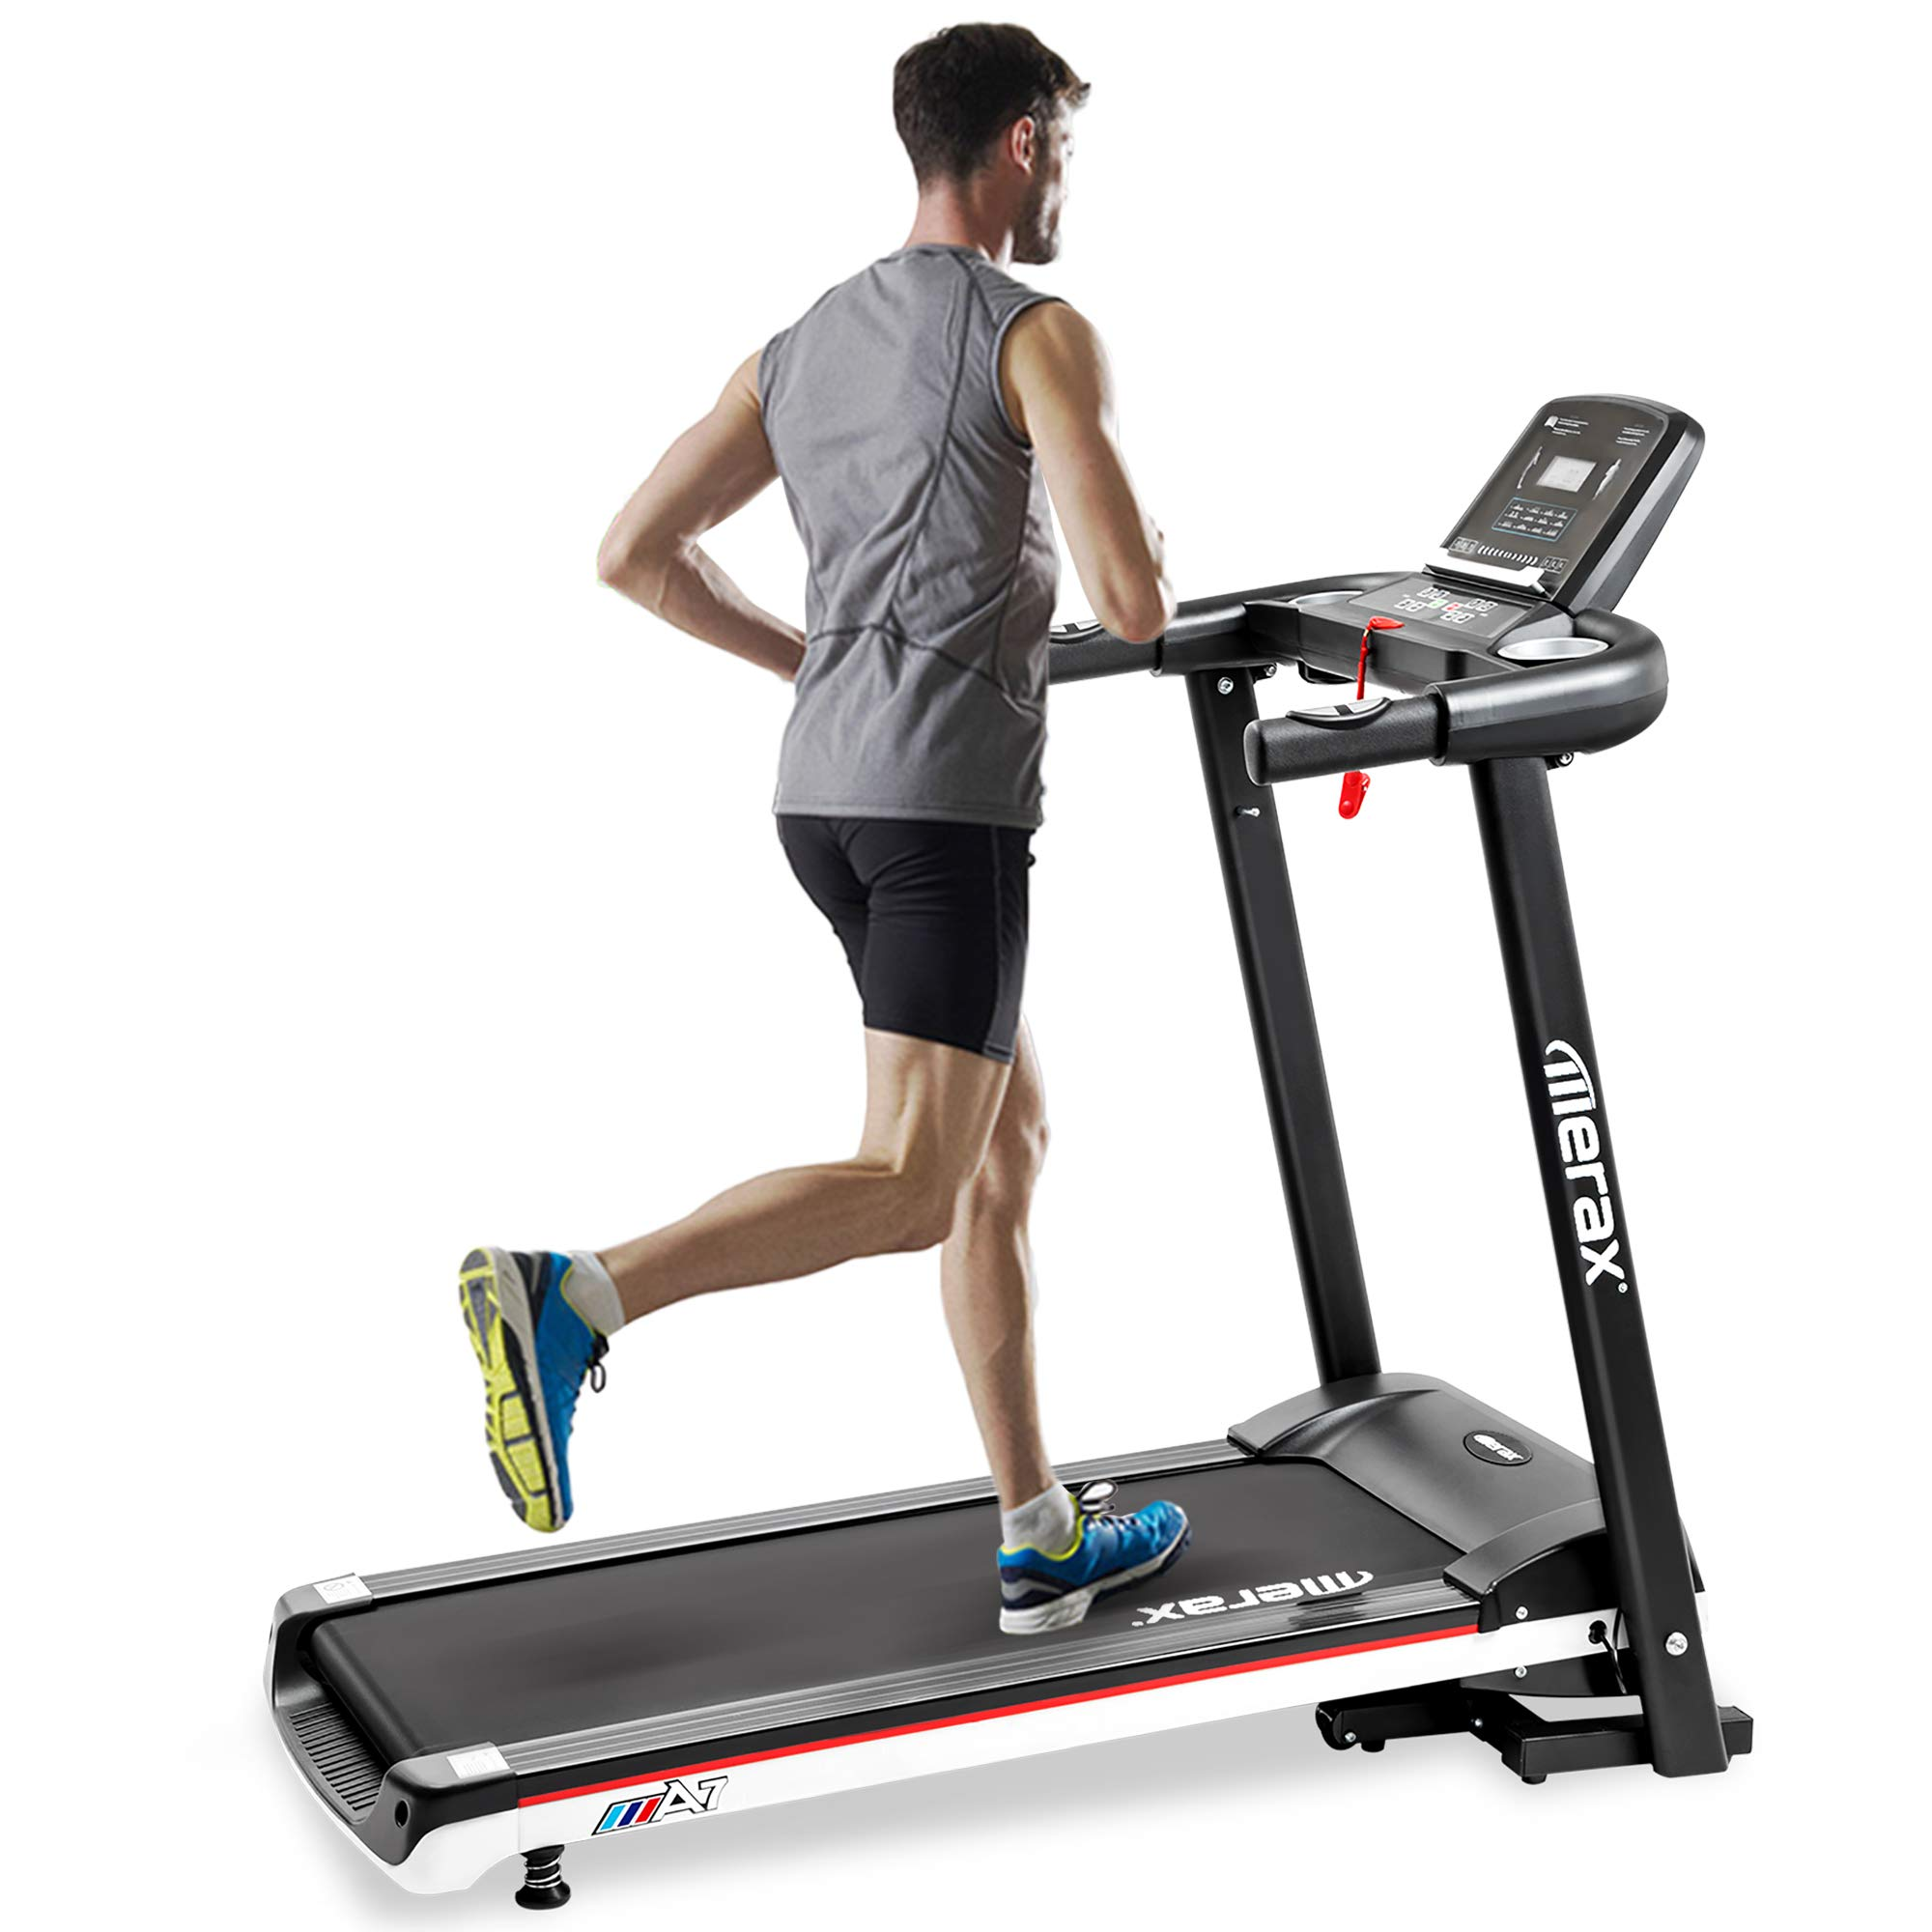 Merax Treadmill Folding Electric Treadmill for Running Easy Assembly Motorized Power Running Machine Fitness